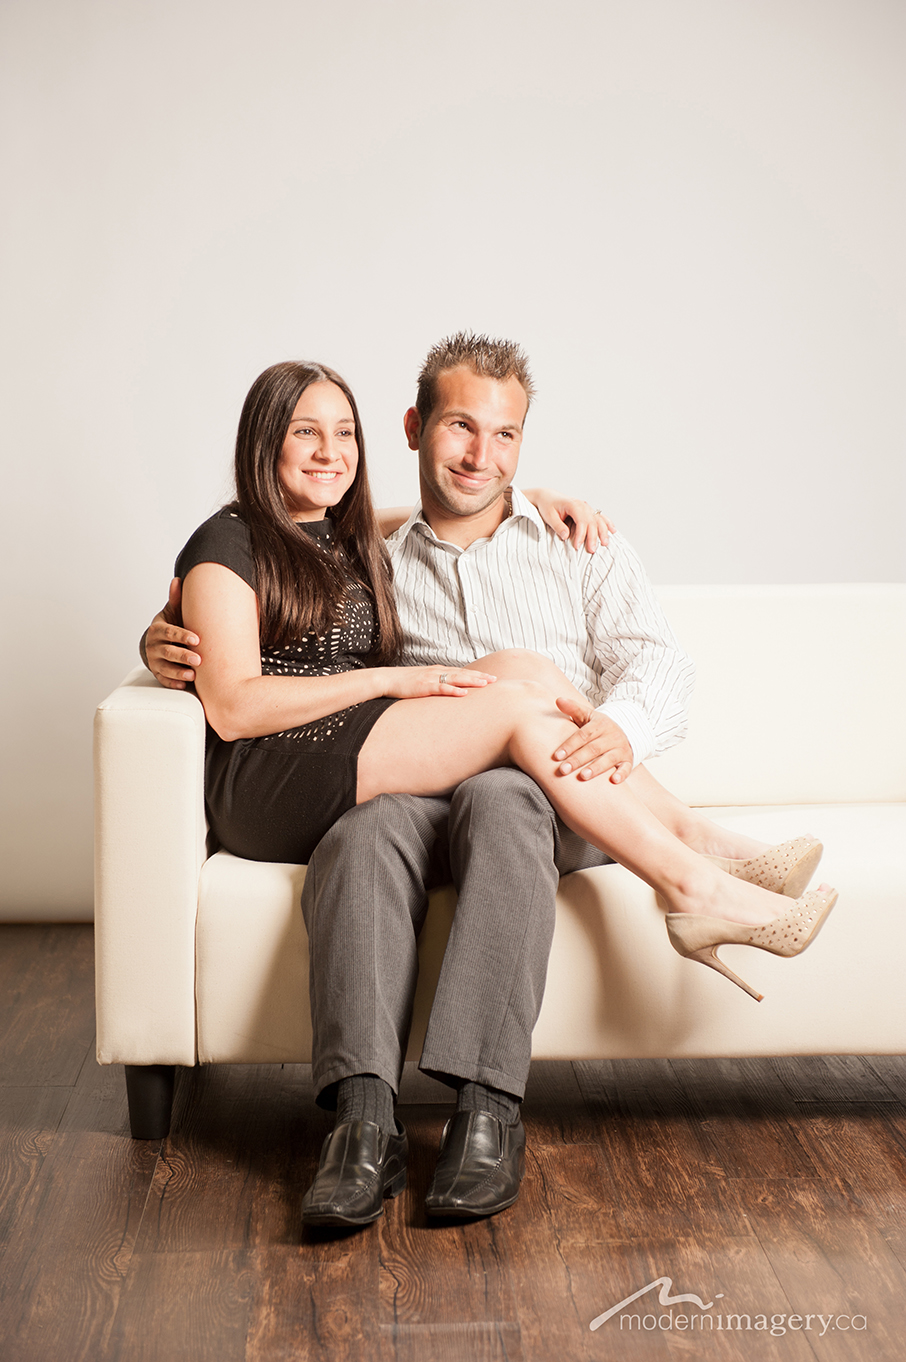 Rita&Tomasso-10.jpg